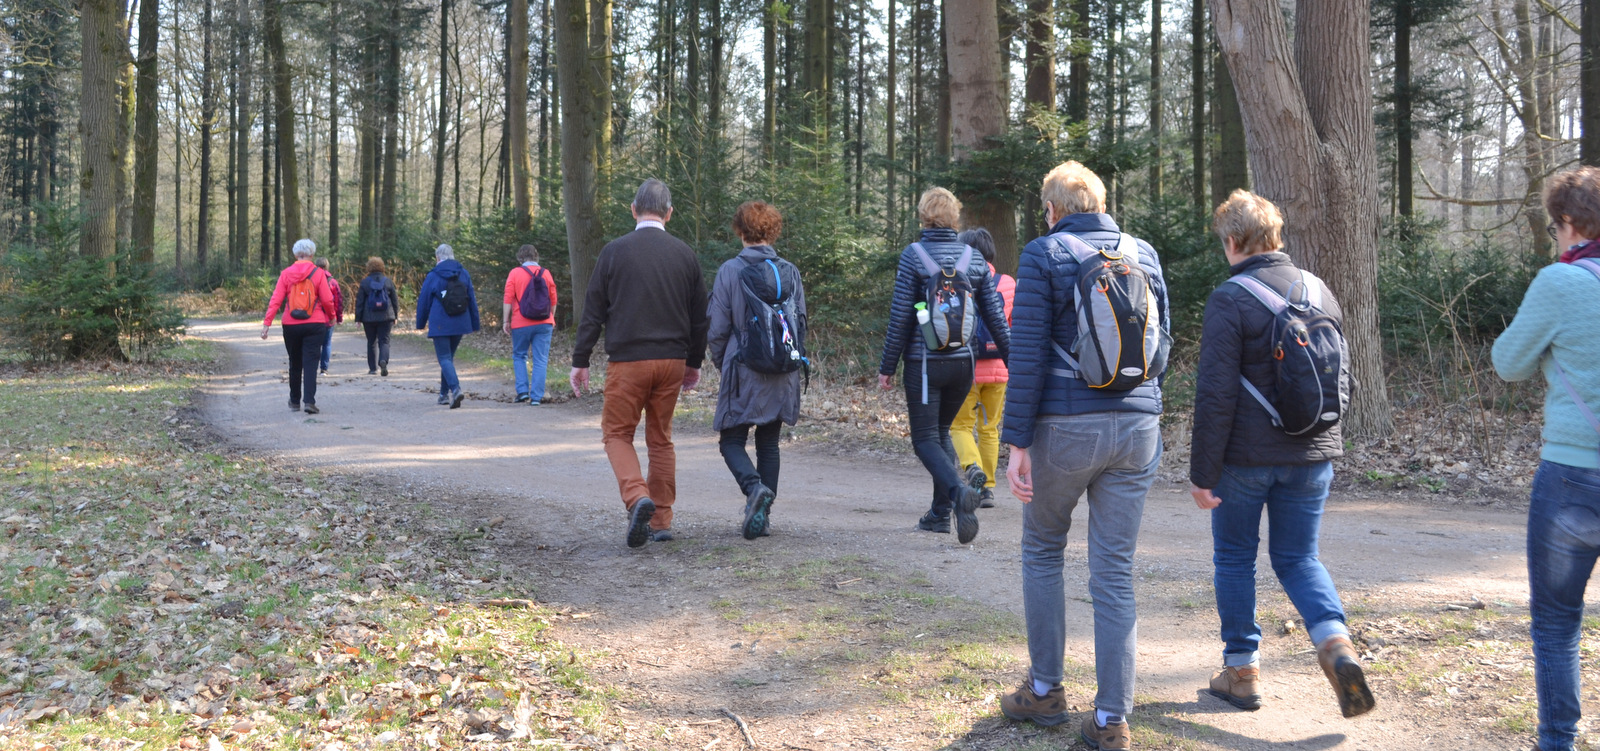 4e Wandel Challenge in het Amsterdamse Bos